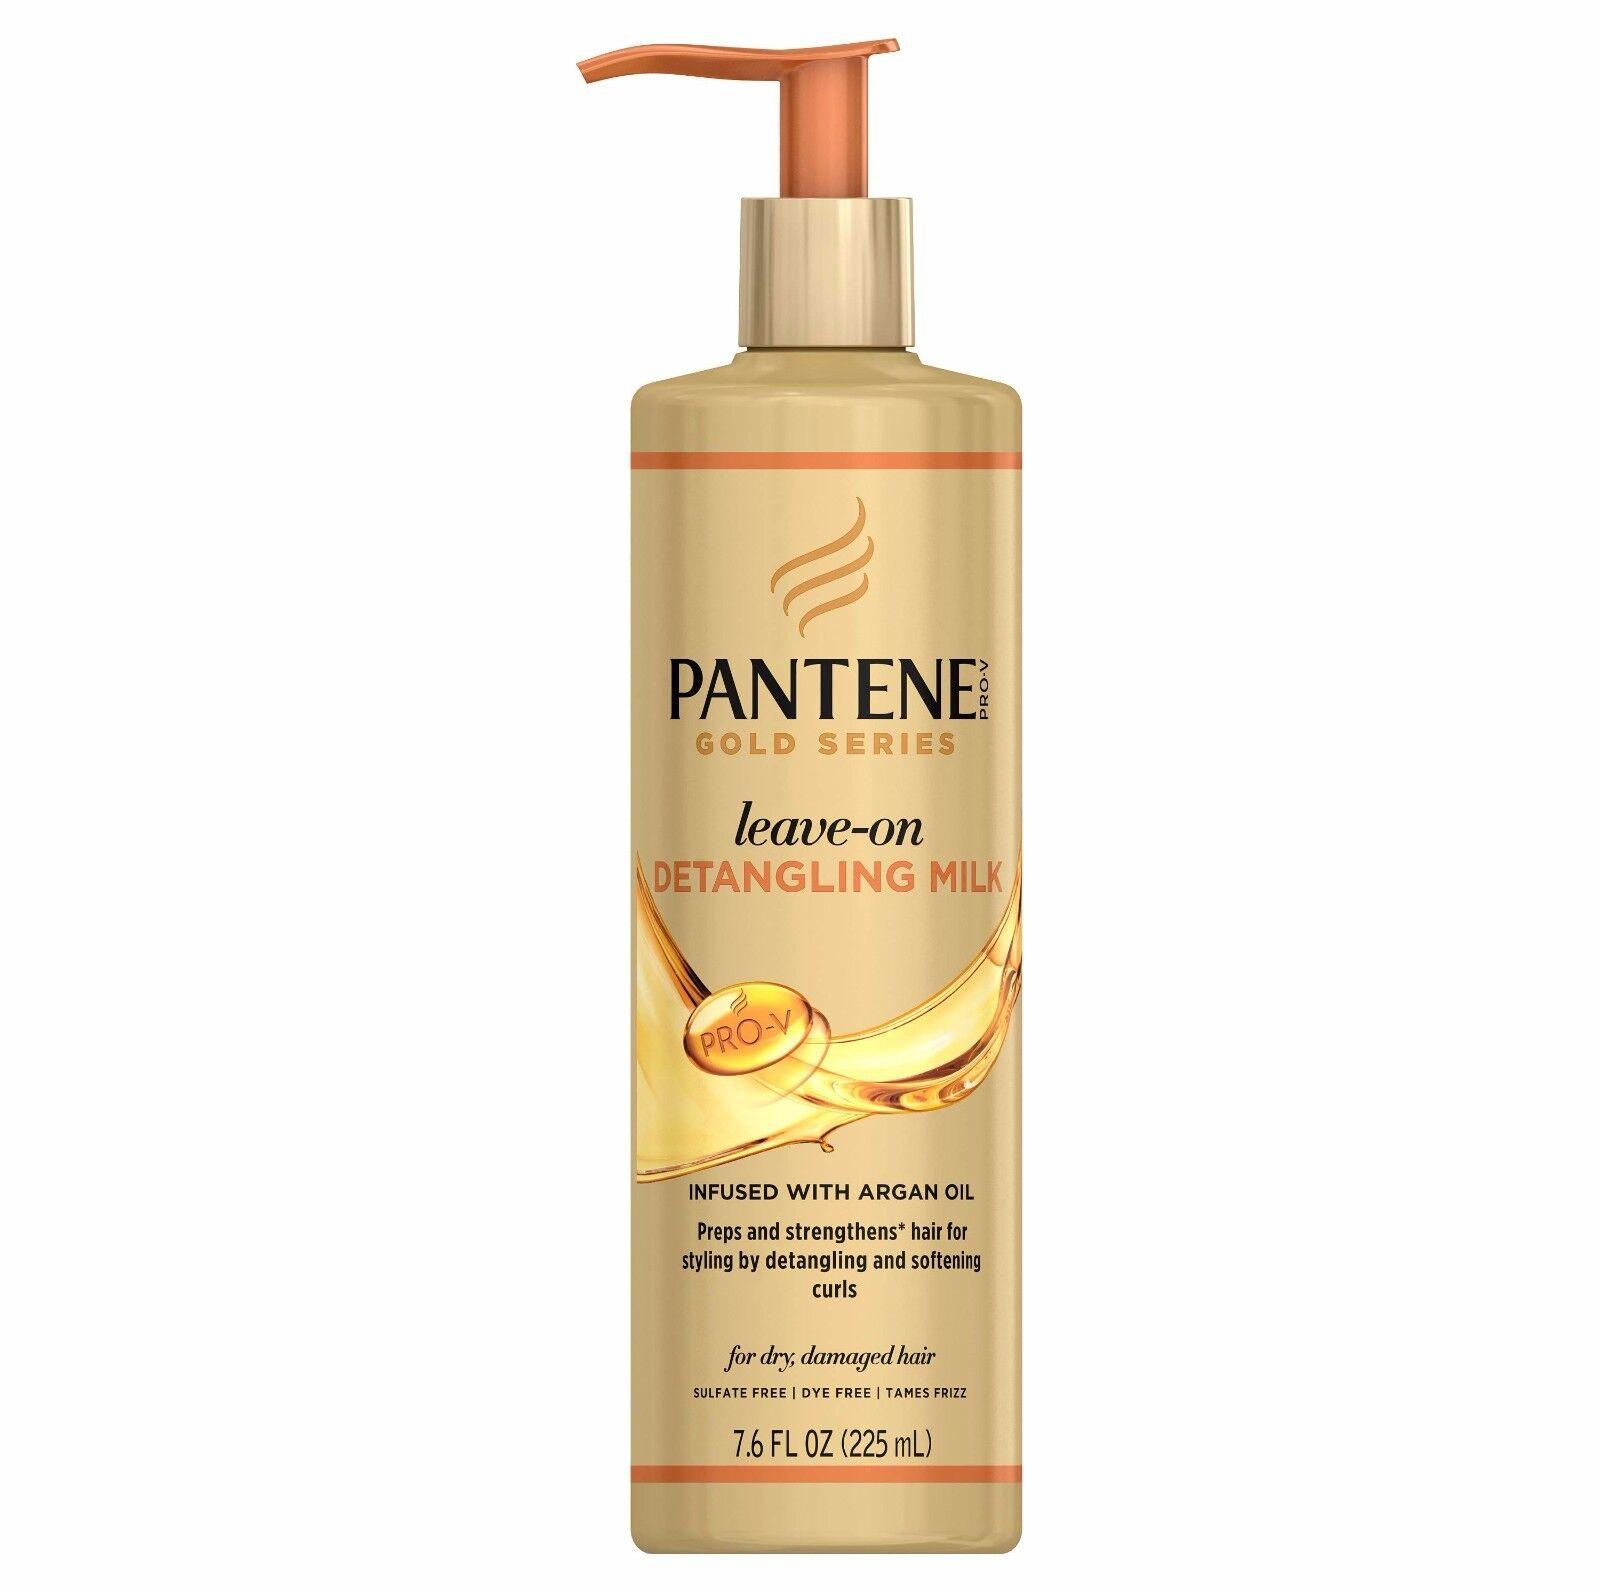 Pantene Gold Series Leave-on Detangling Milk Argan Styling S